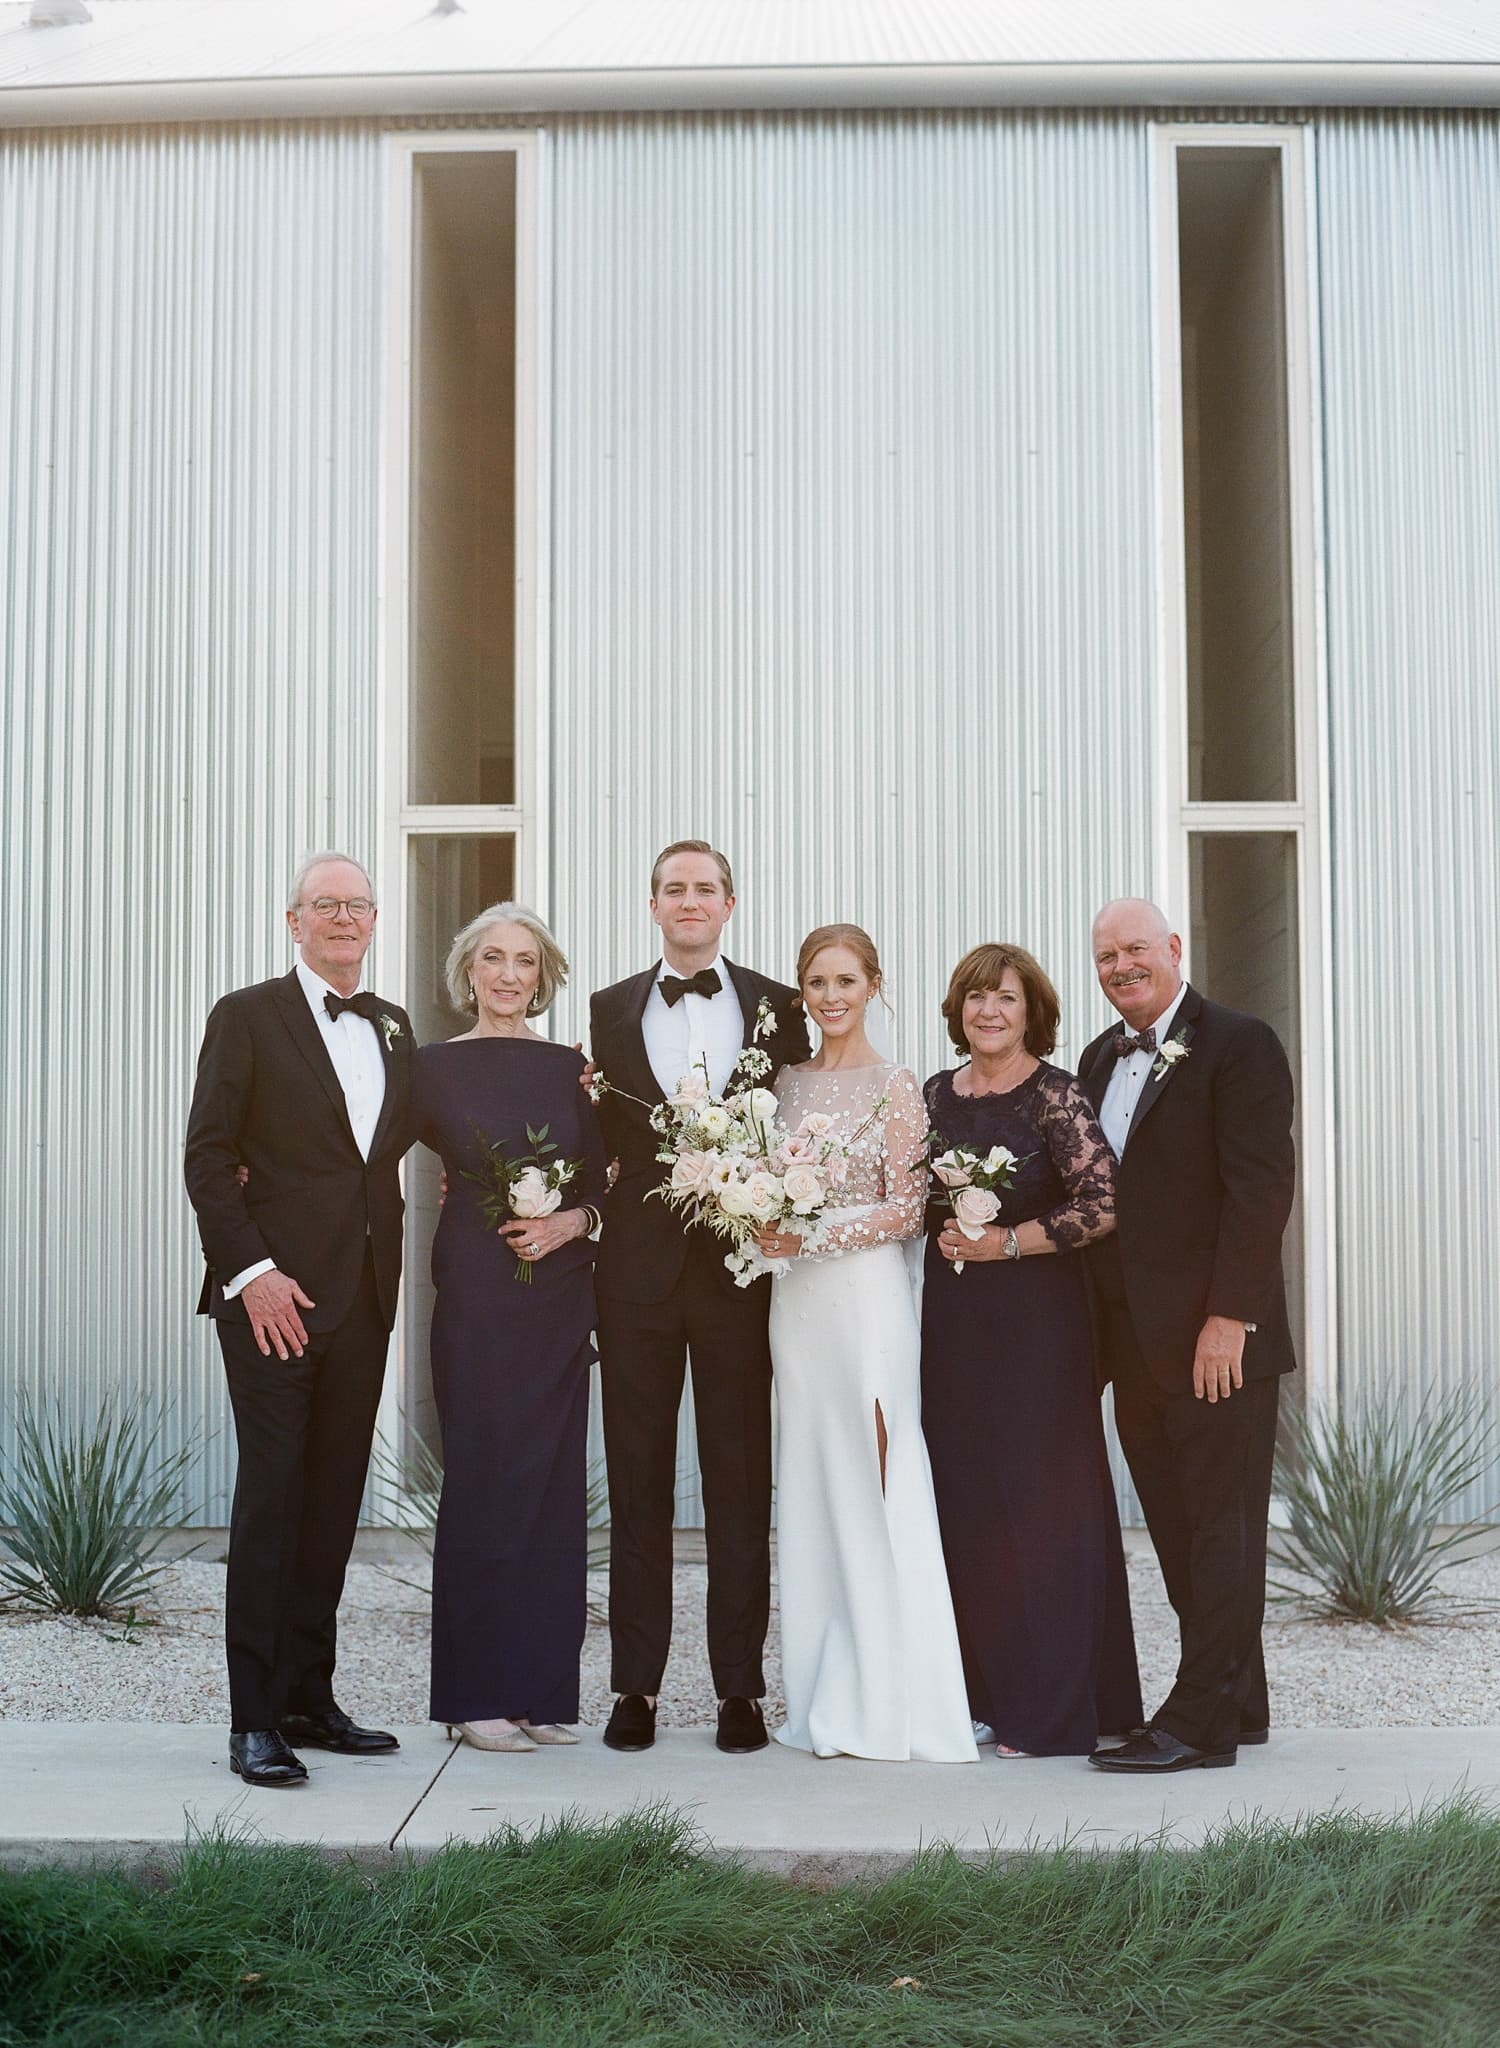 prospect-house-wedding-34.jpg